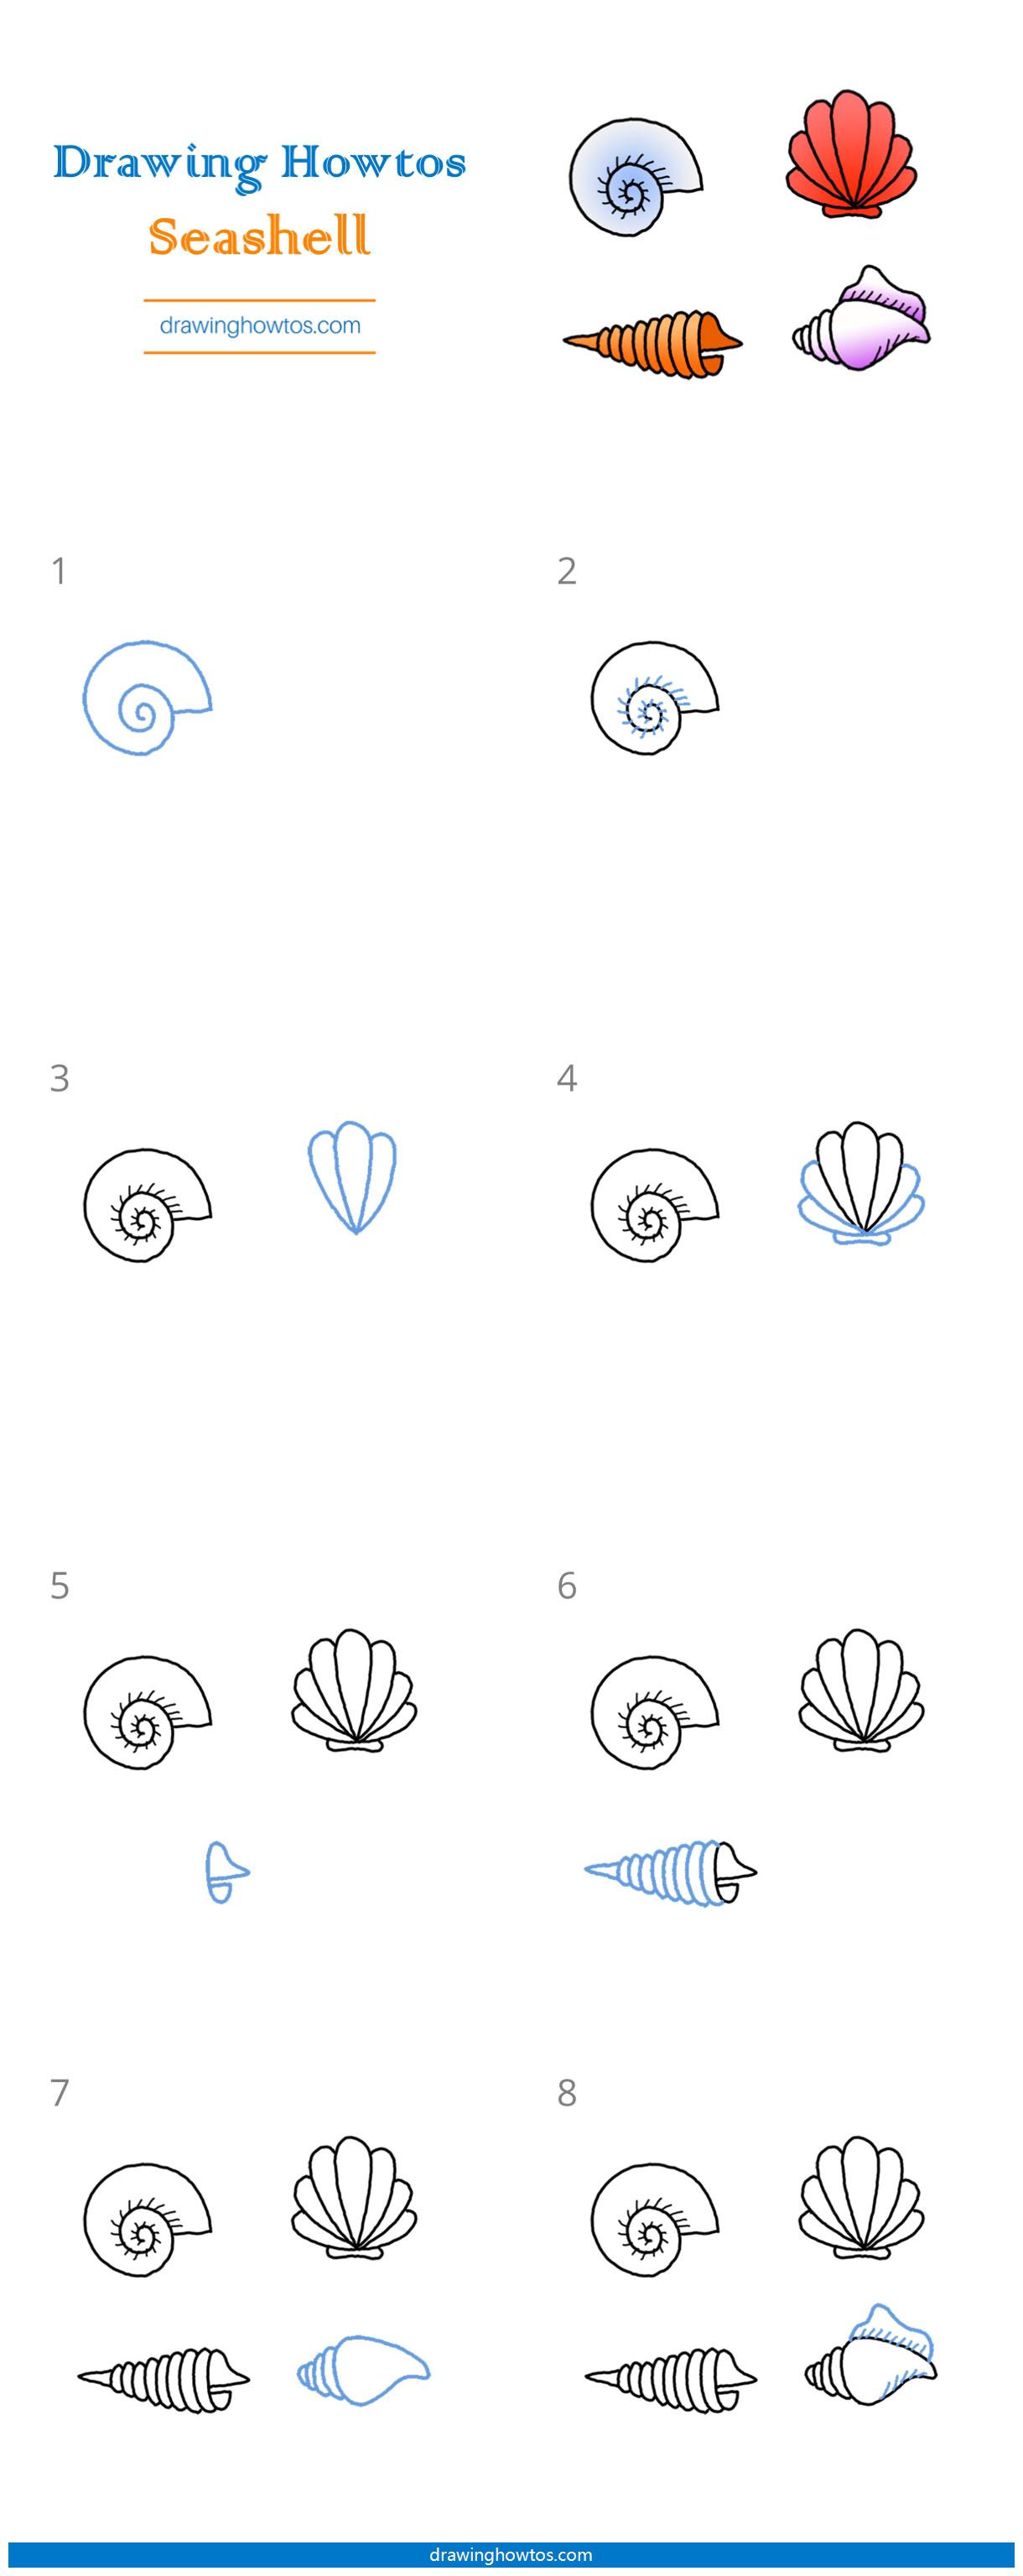 How To Draw A Seashell : seashell, Seashell, Drawing, Guides, Howtos